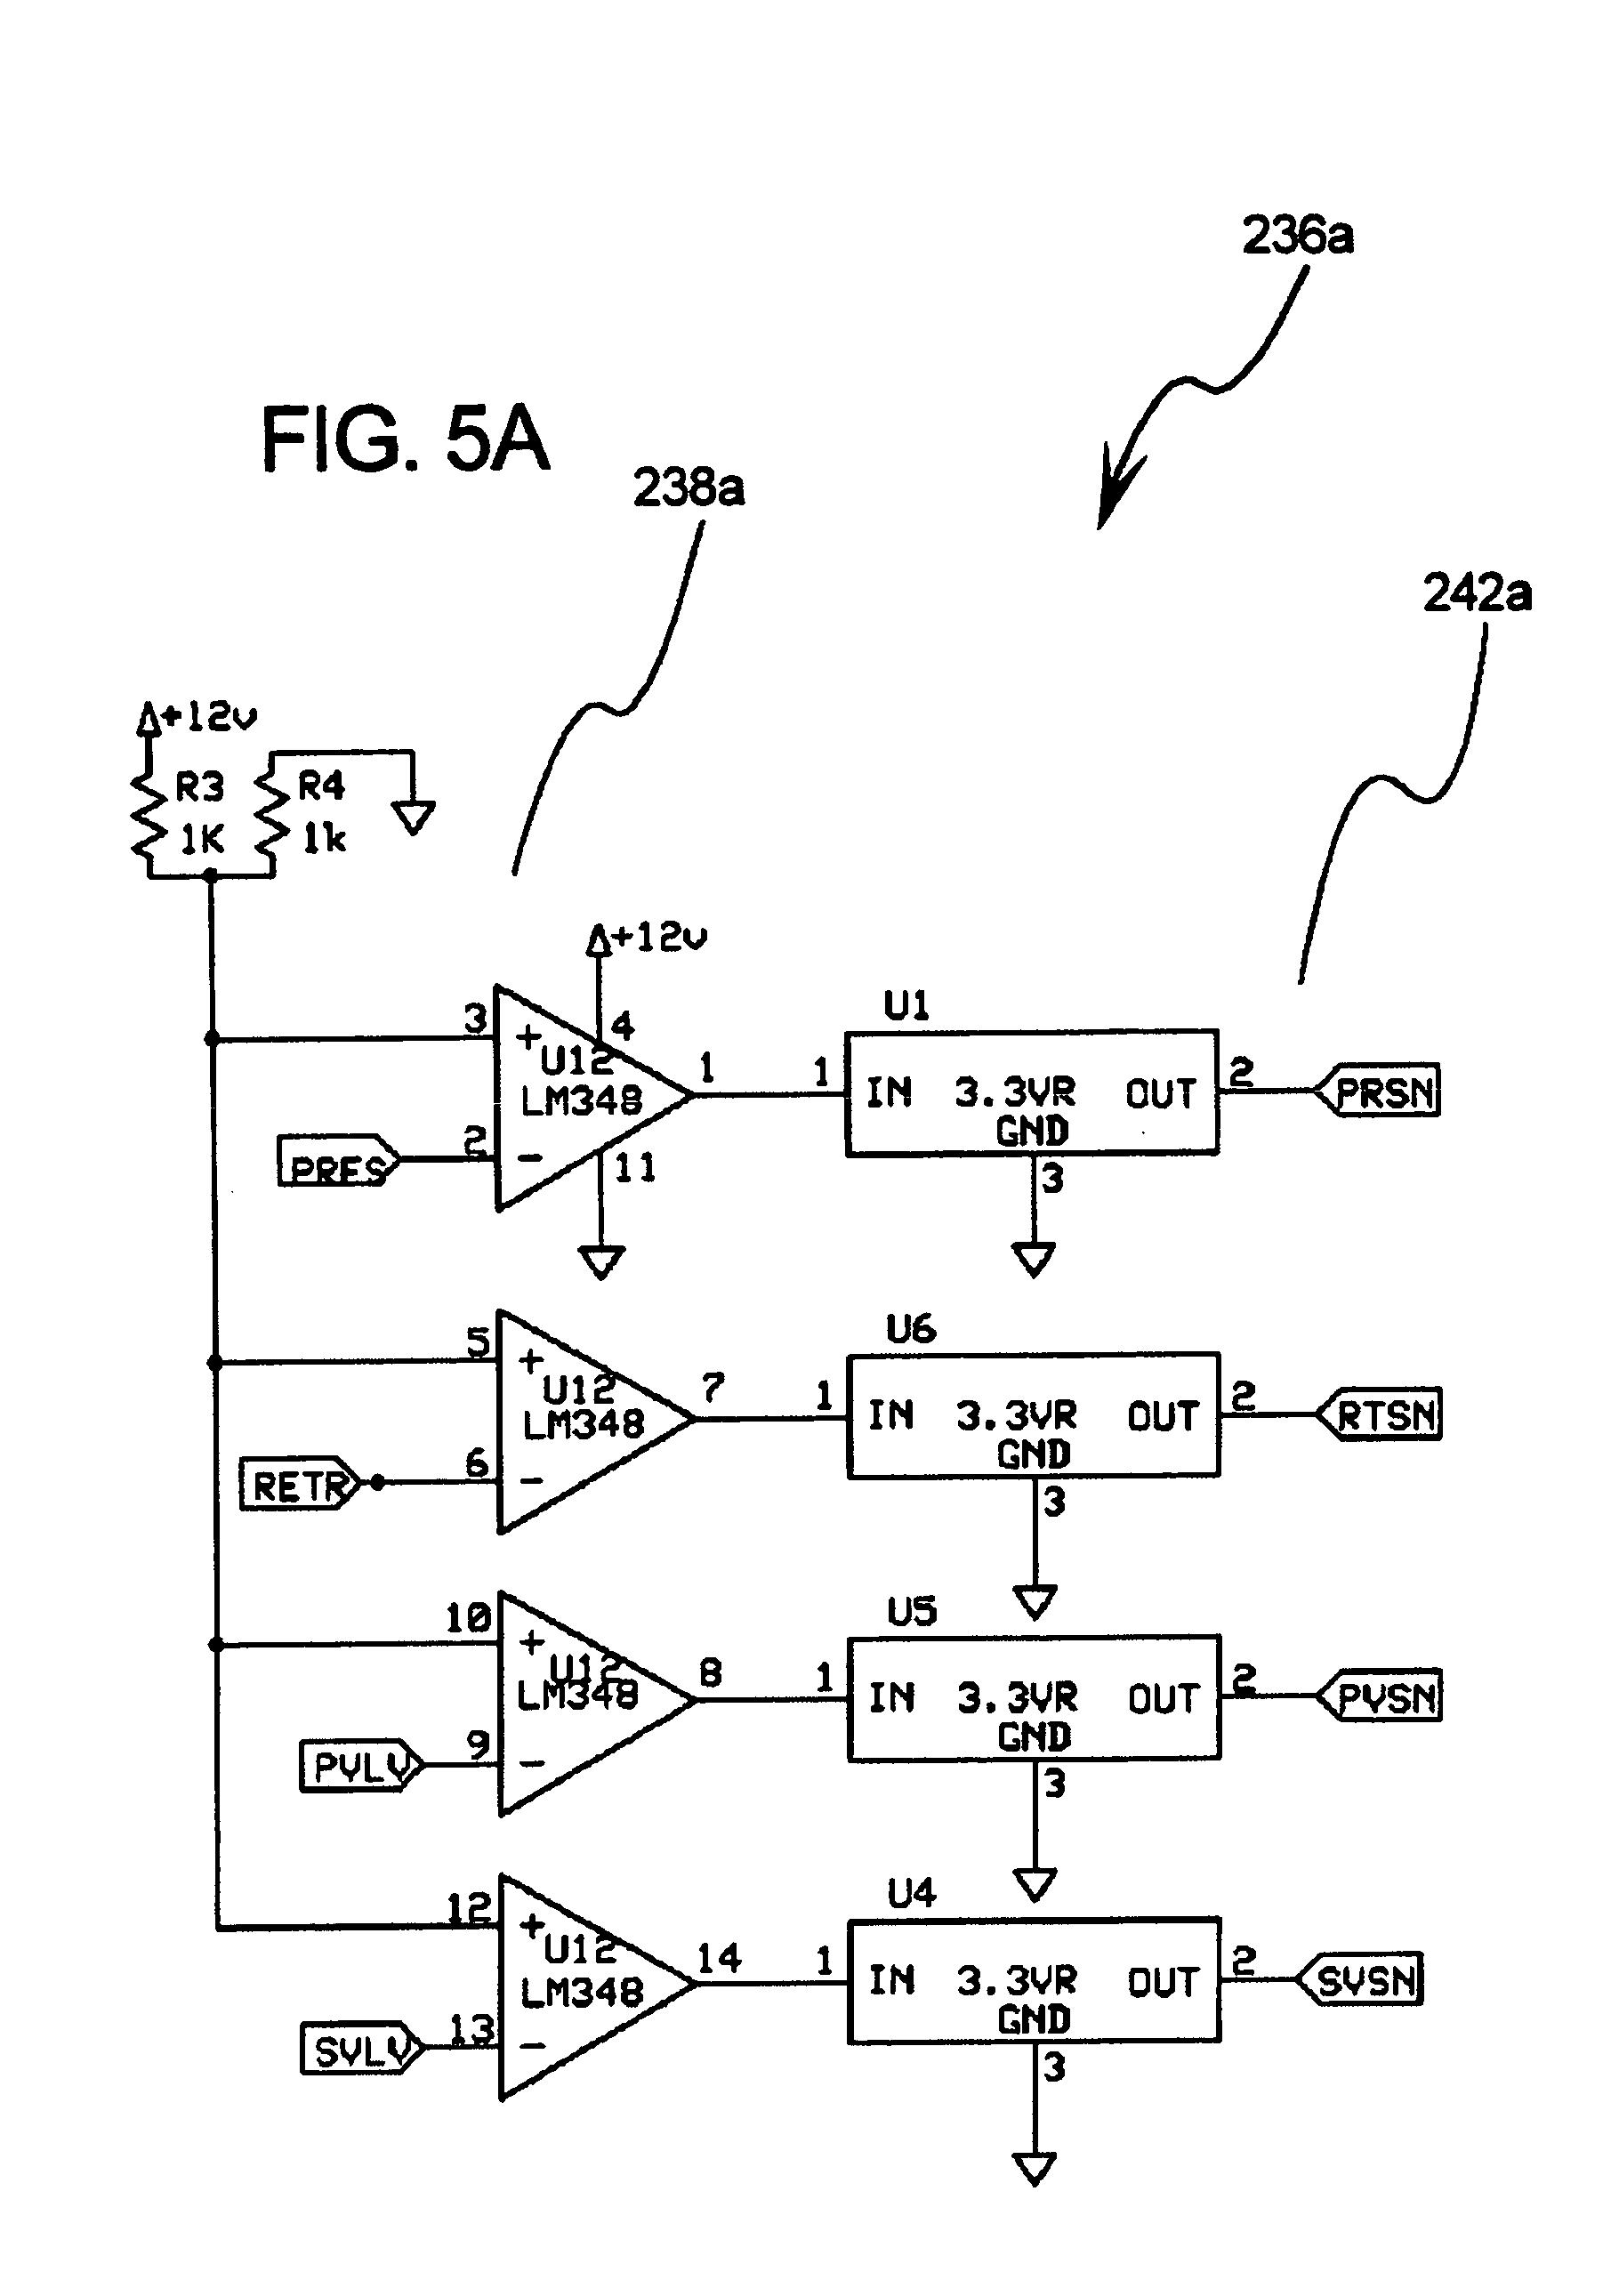 Bennett Trim Tab Wiring Diagram Kanvamath Org Pump